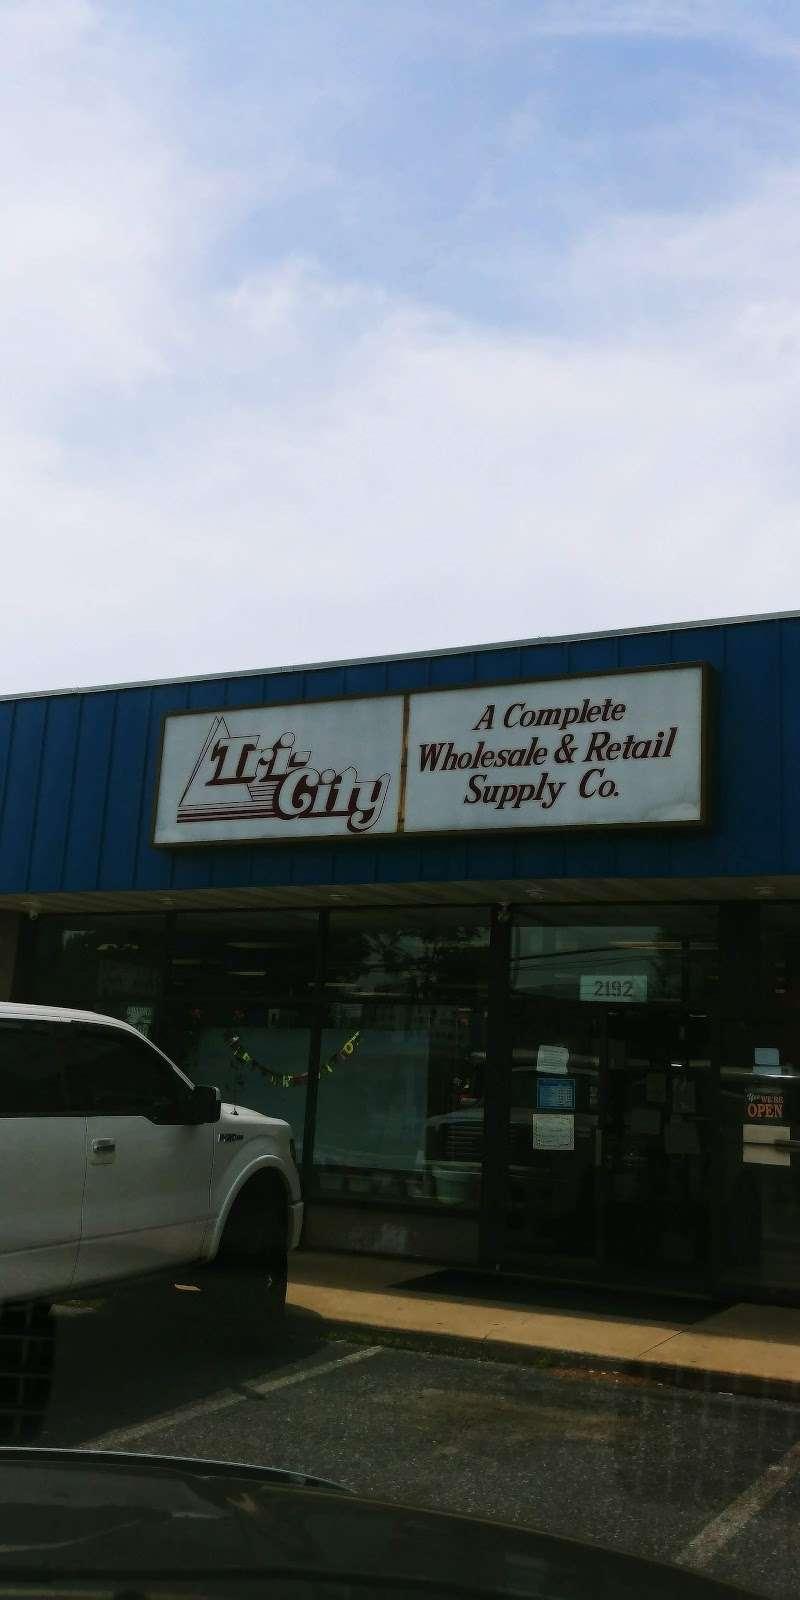 Tri-City Paper Restaurant & Bar Supply - store    Photo 5 of 5   Address: 2192 S Delsea Dr, Vineland, NJ 08360, USA   Phone: (856) 692-6050